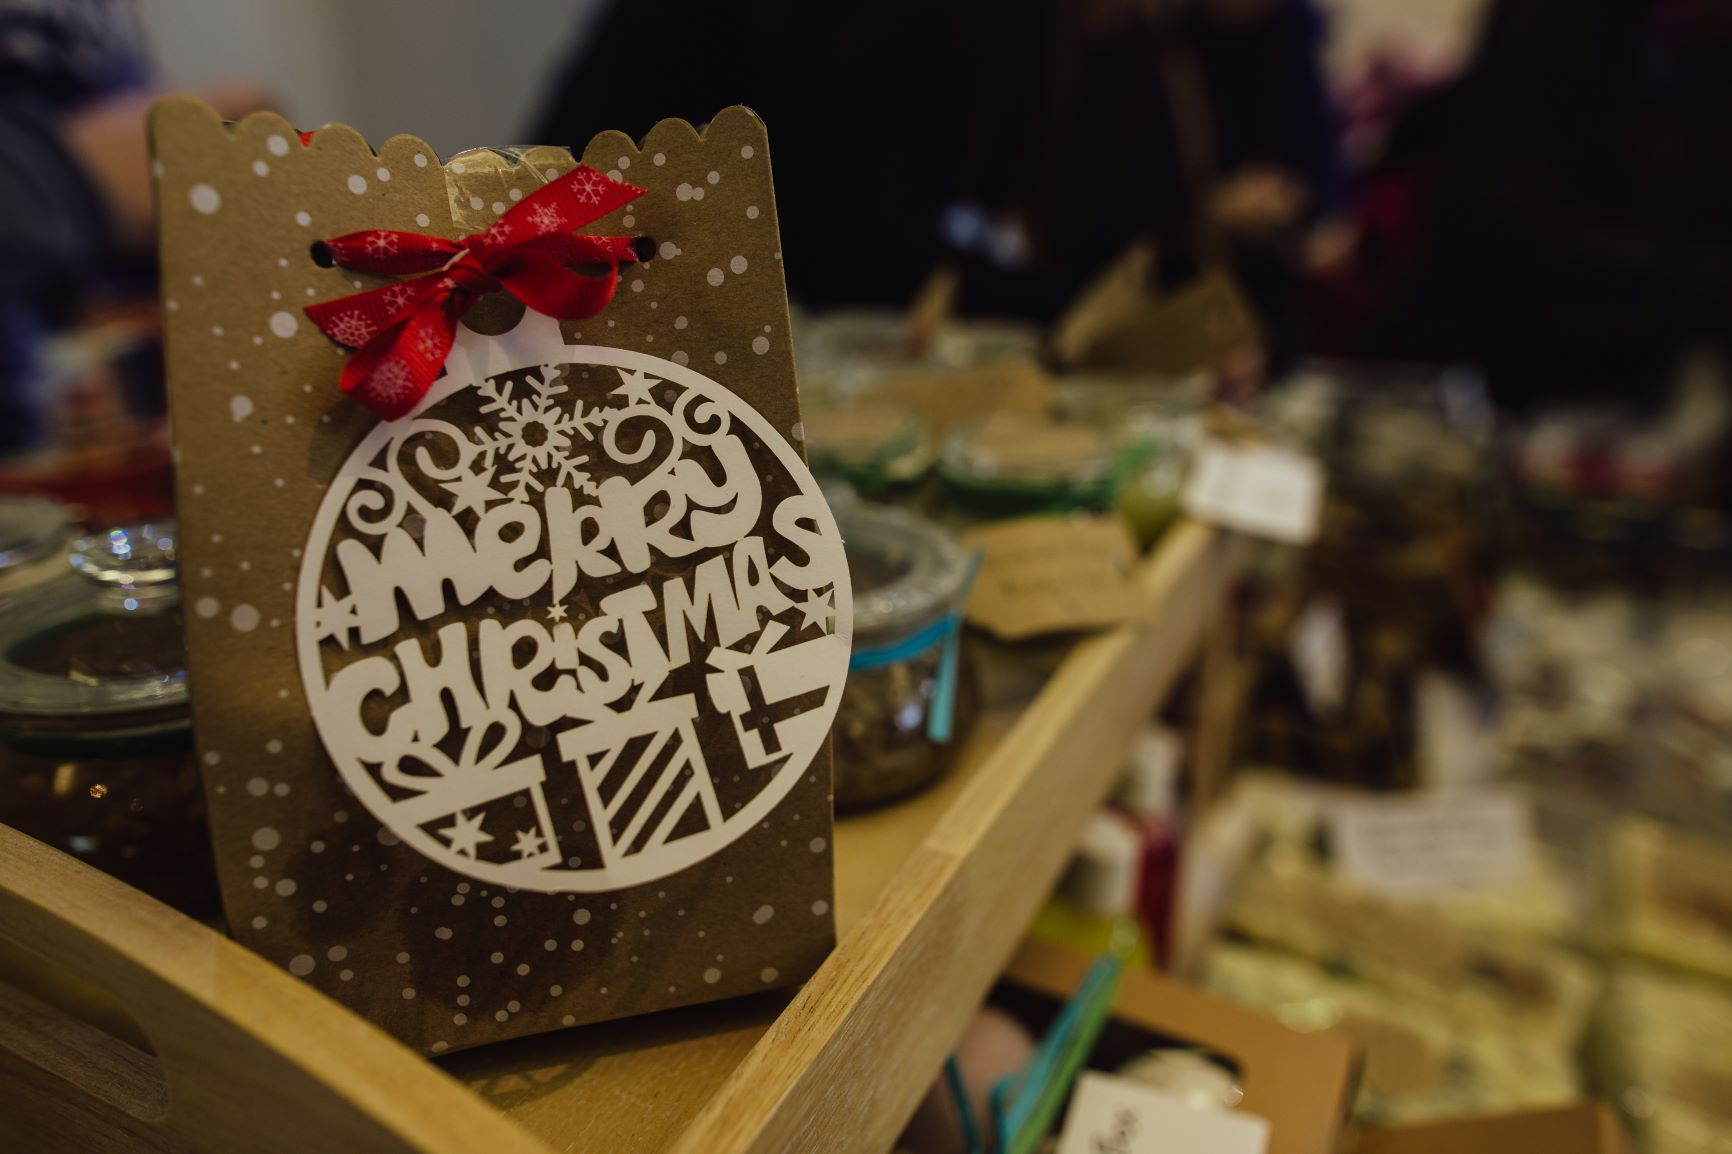 merry christmas market